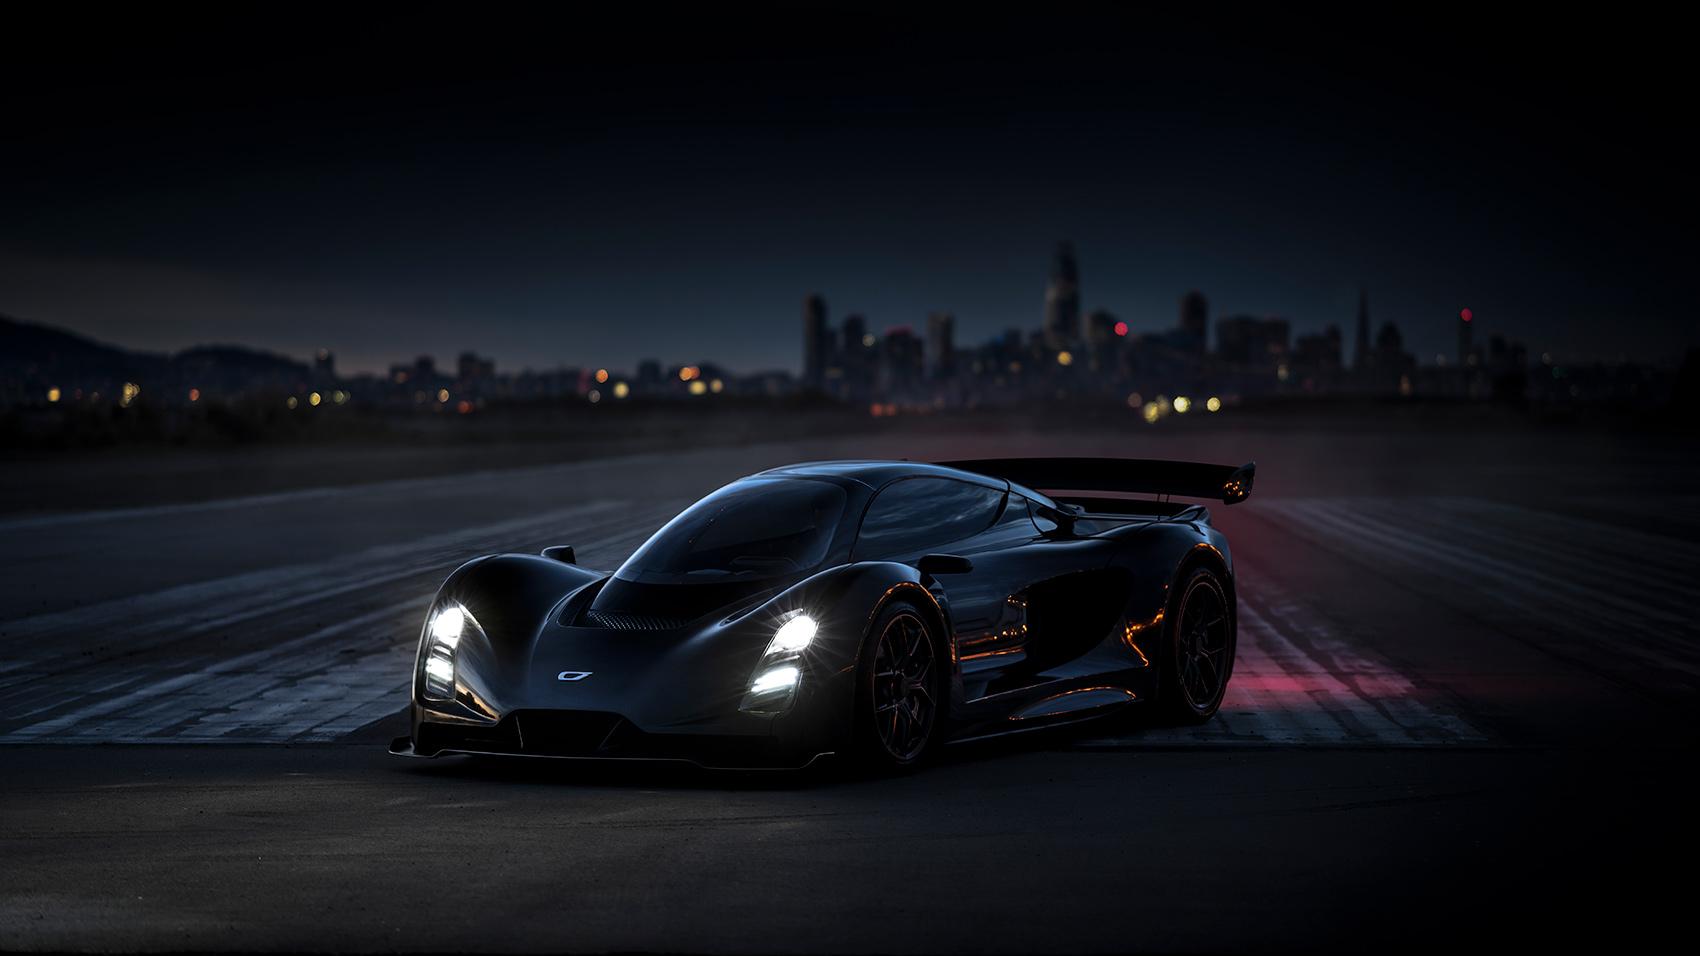 Denne bilen skal klare 0-100 km/t på under 2 sekunder. (Alle foto: Czinger)